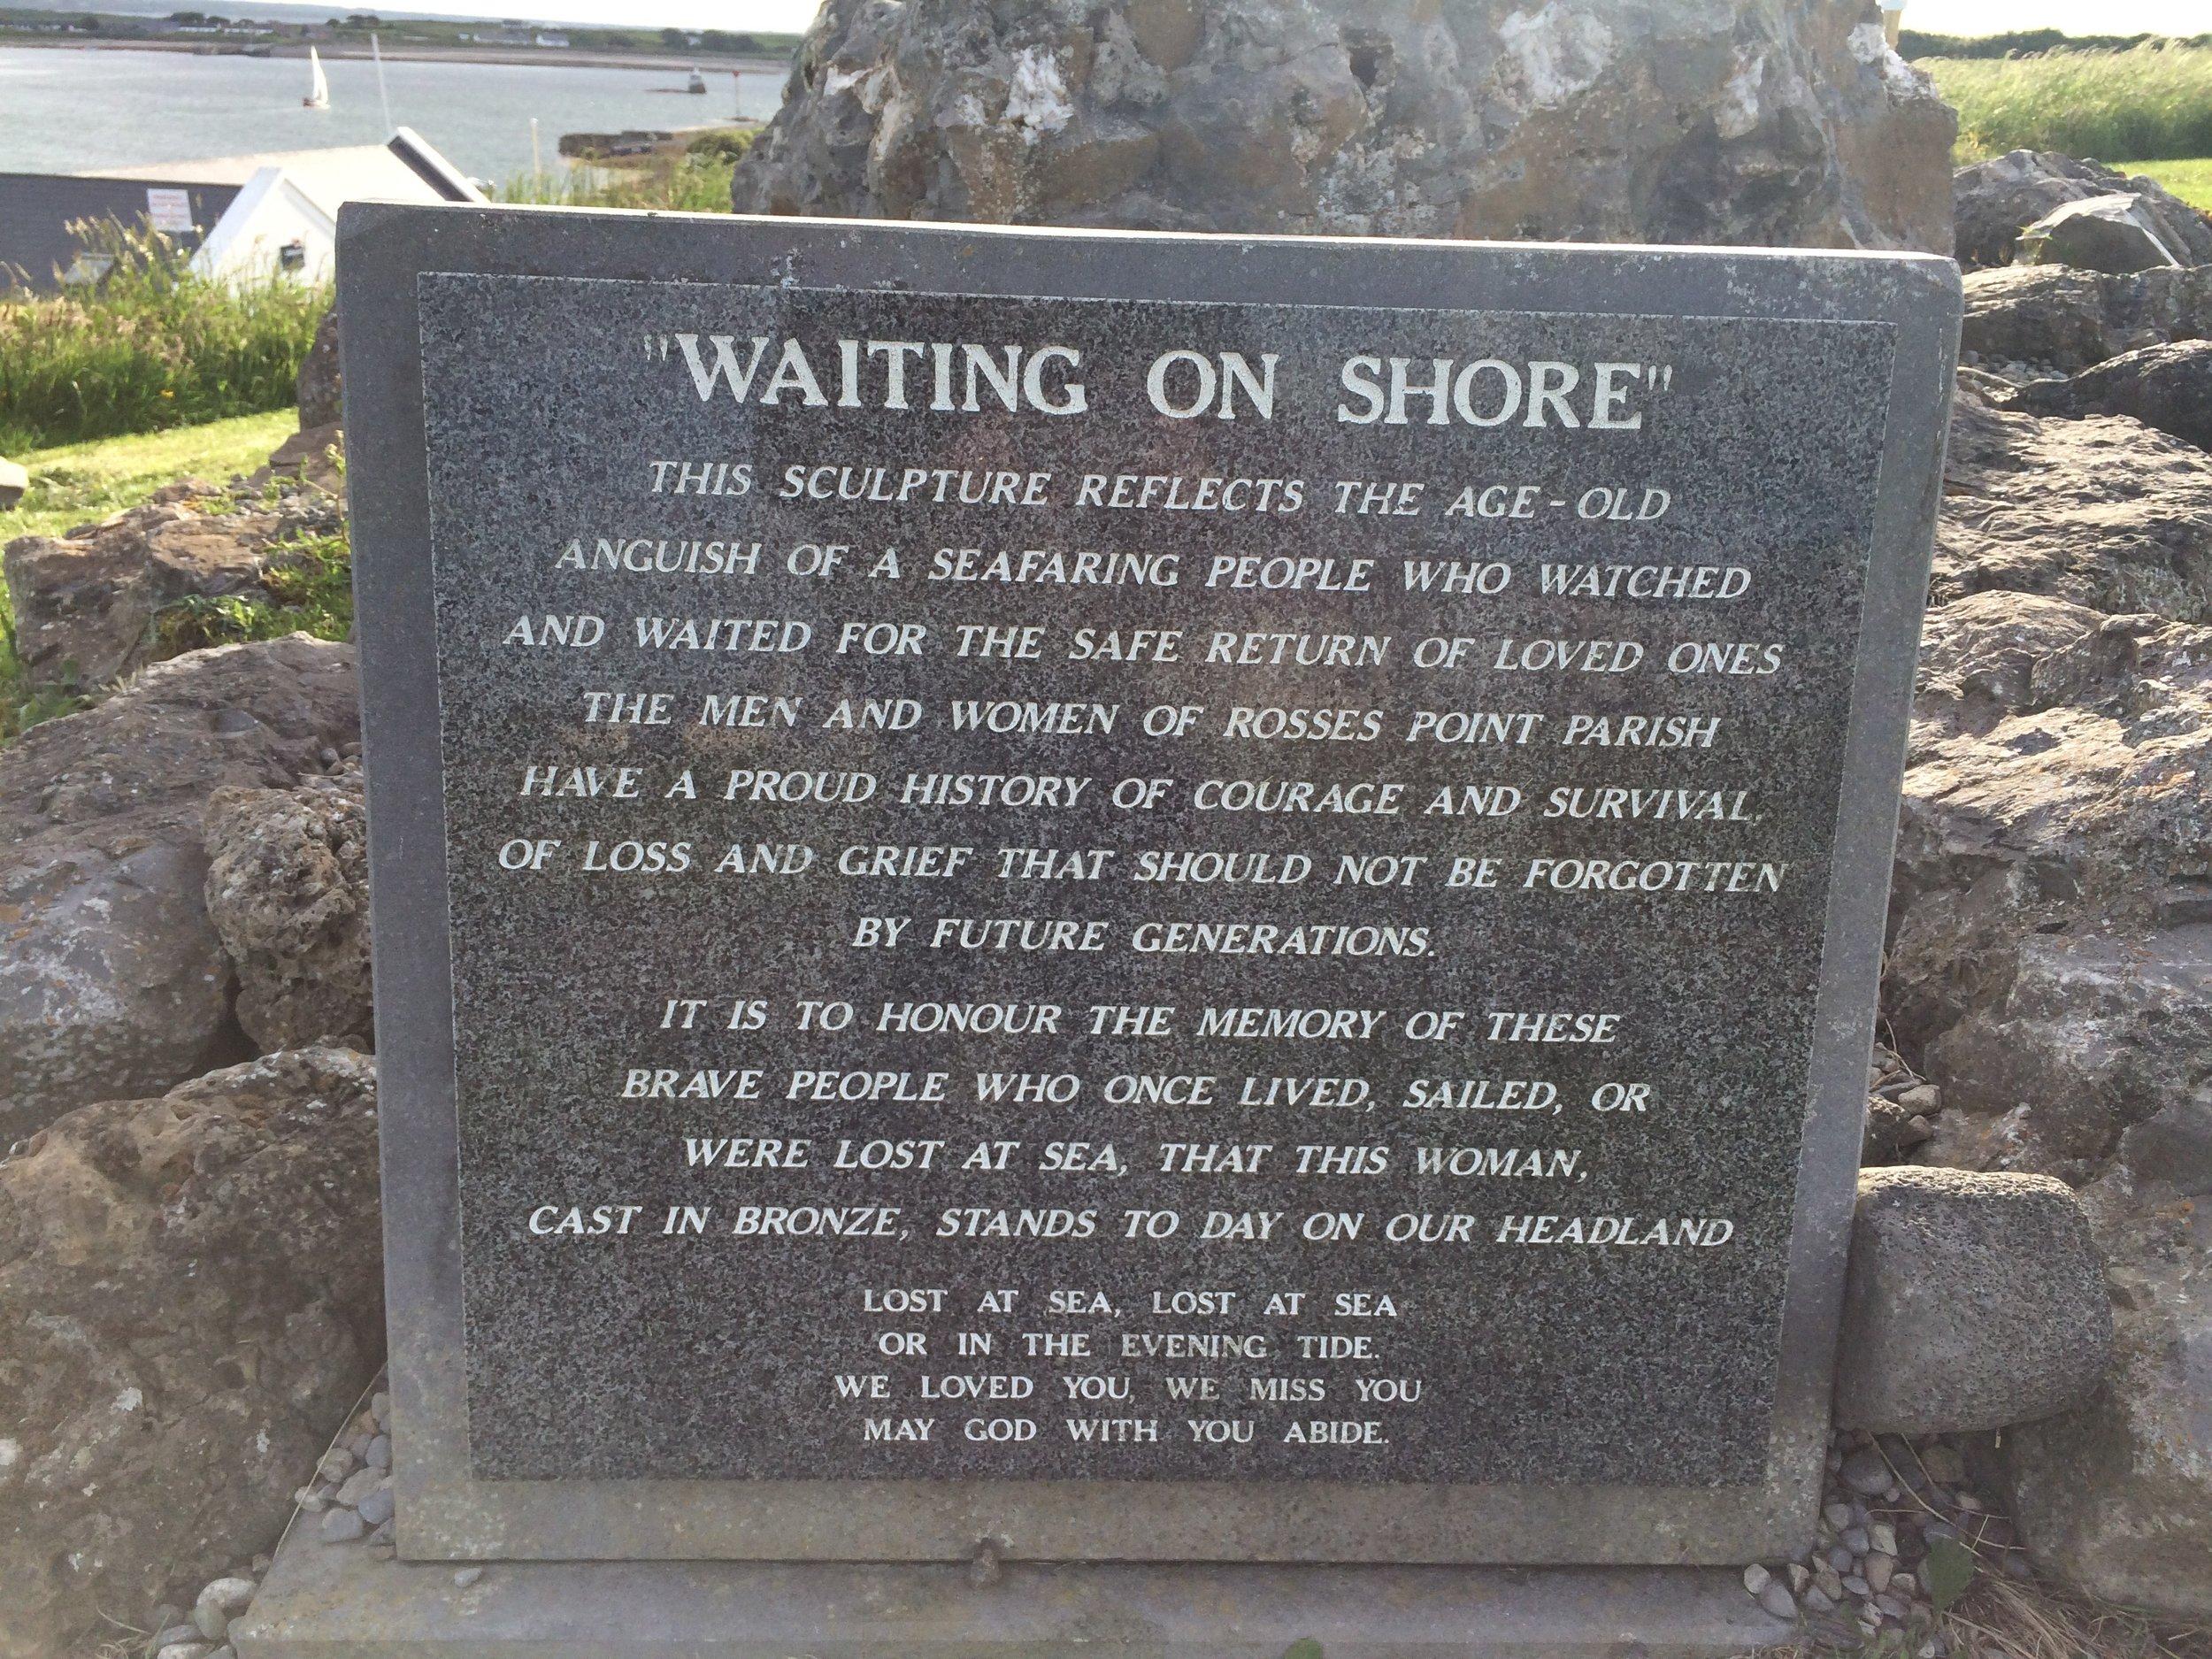 Waiting on Shore.